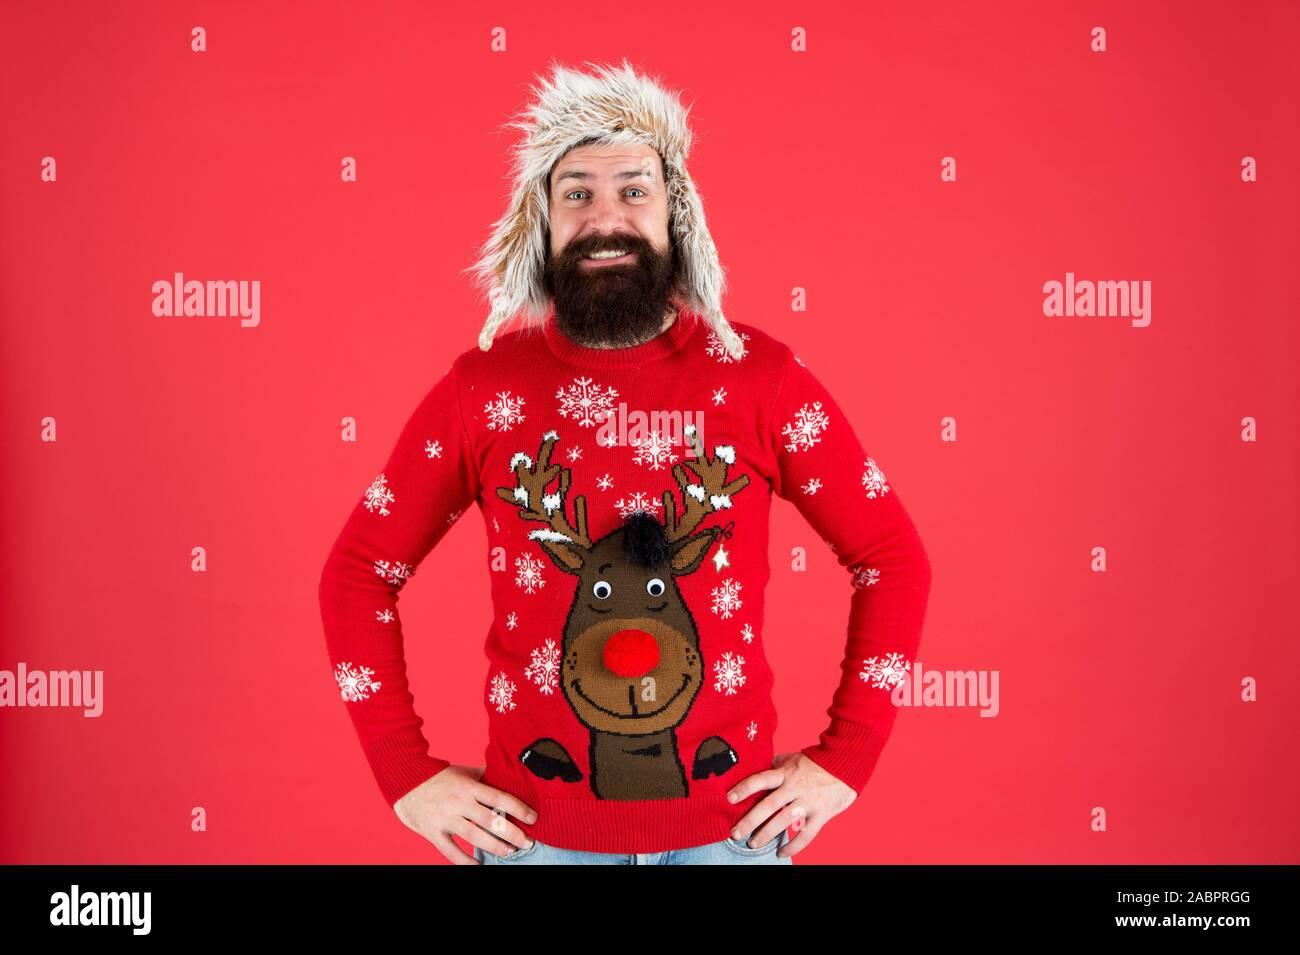 Santa Beard Funny Novelty Gifts Christmas Jumper Sweater